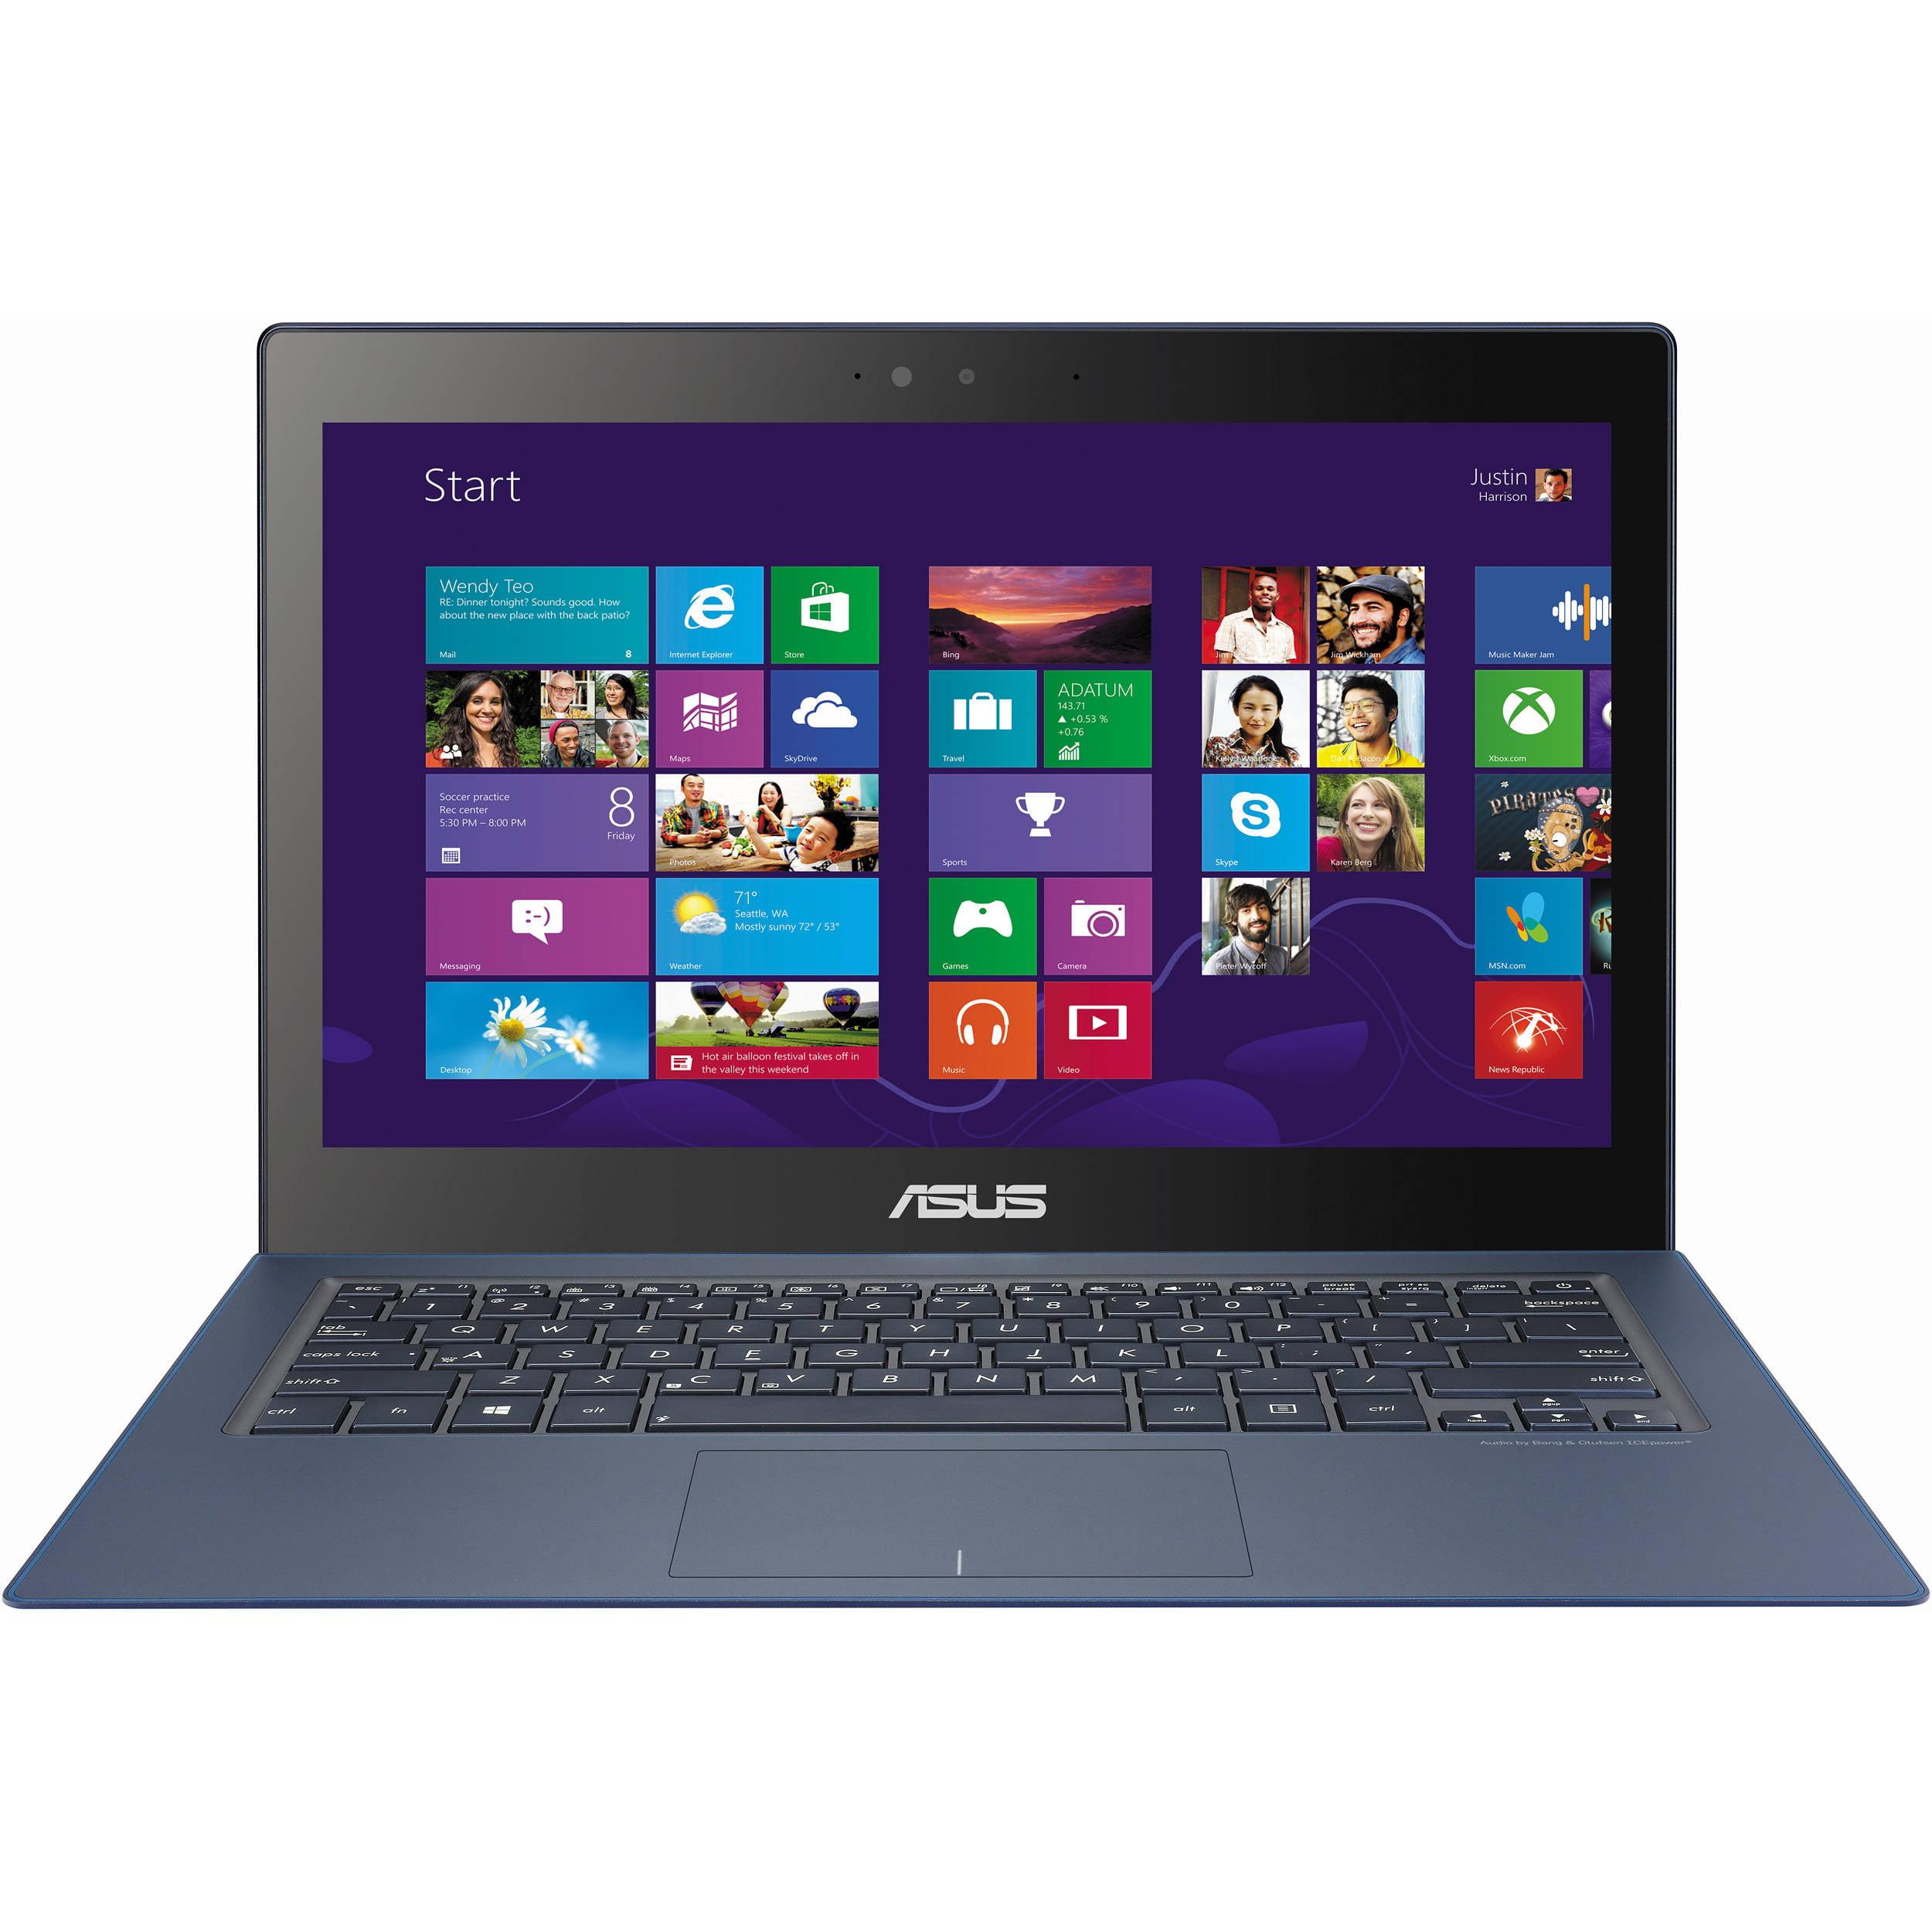 New Asus UX301LA 13.3 Touch Laptop i7-5500U 2.4GHz 8GB 256GB SSD Win10|UX301LA-WS71T by ASUS